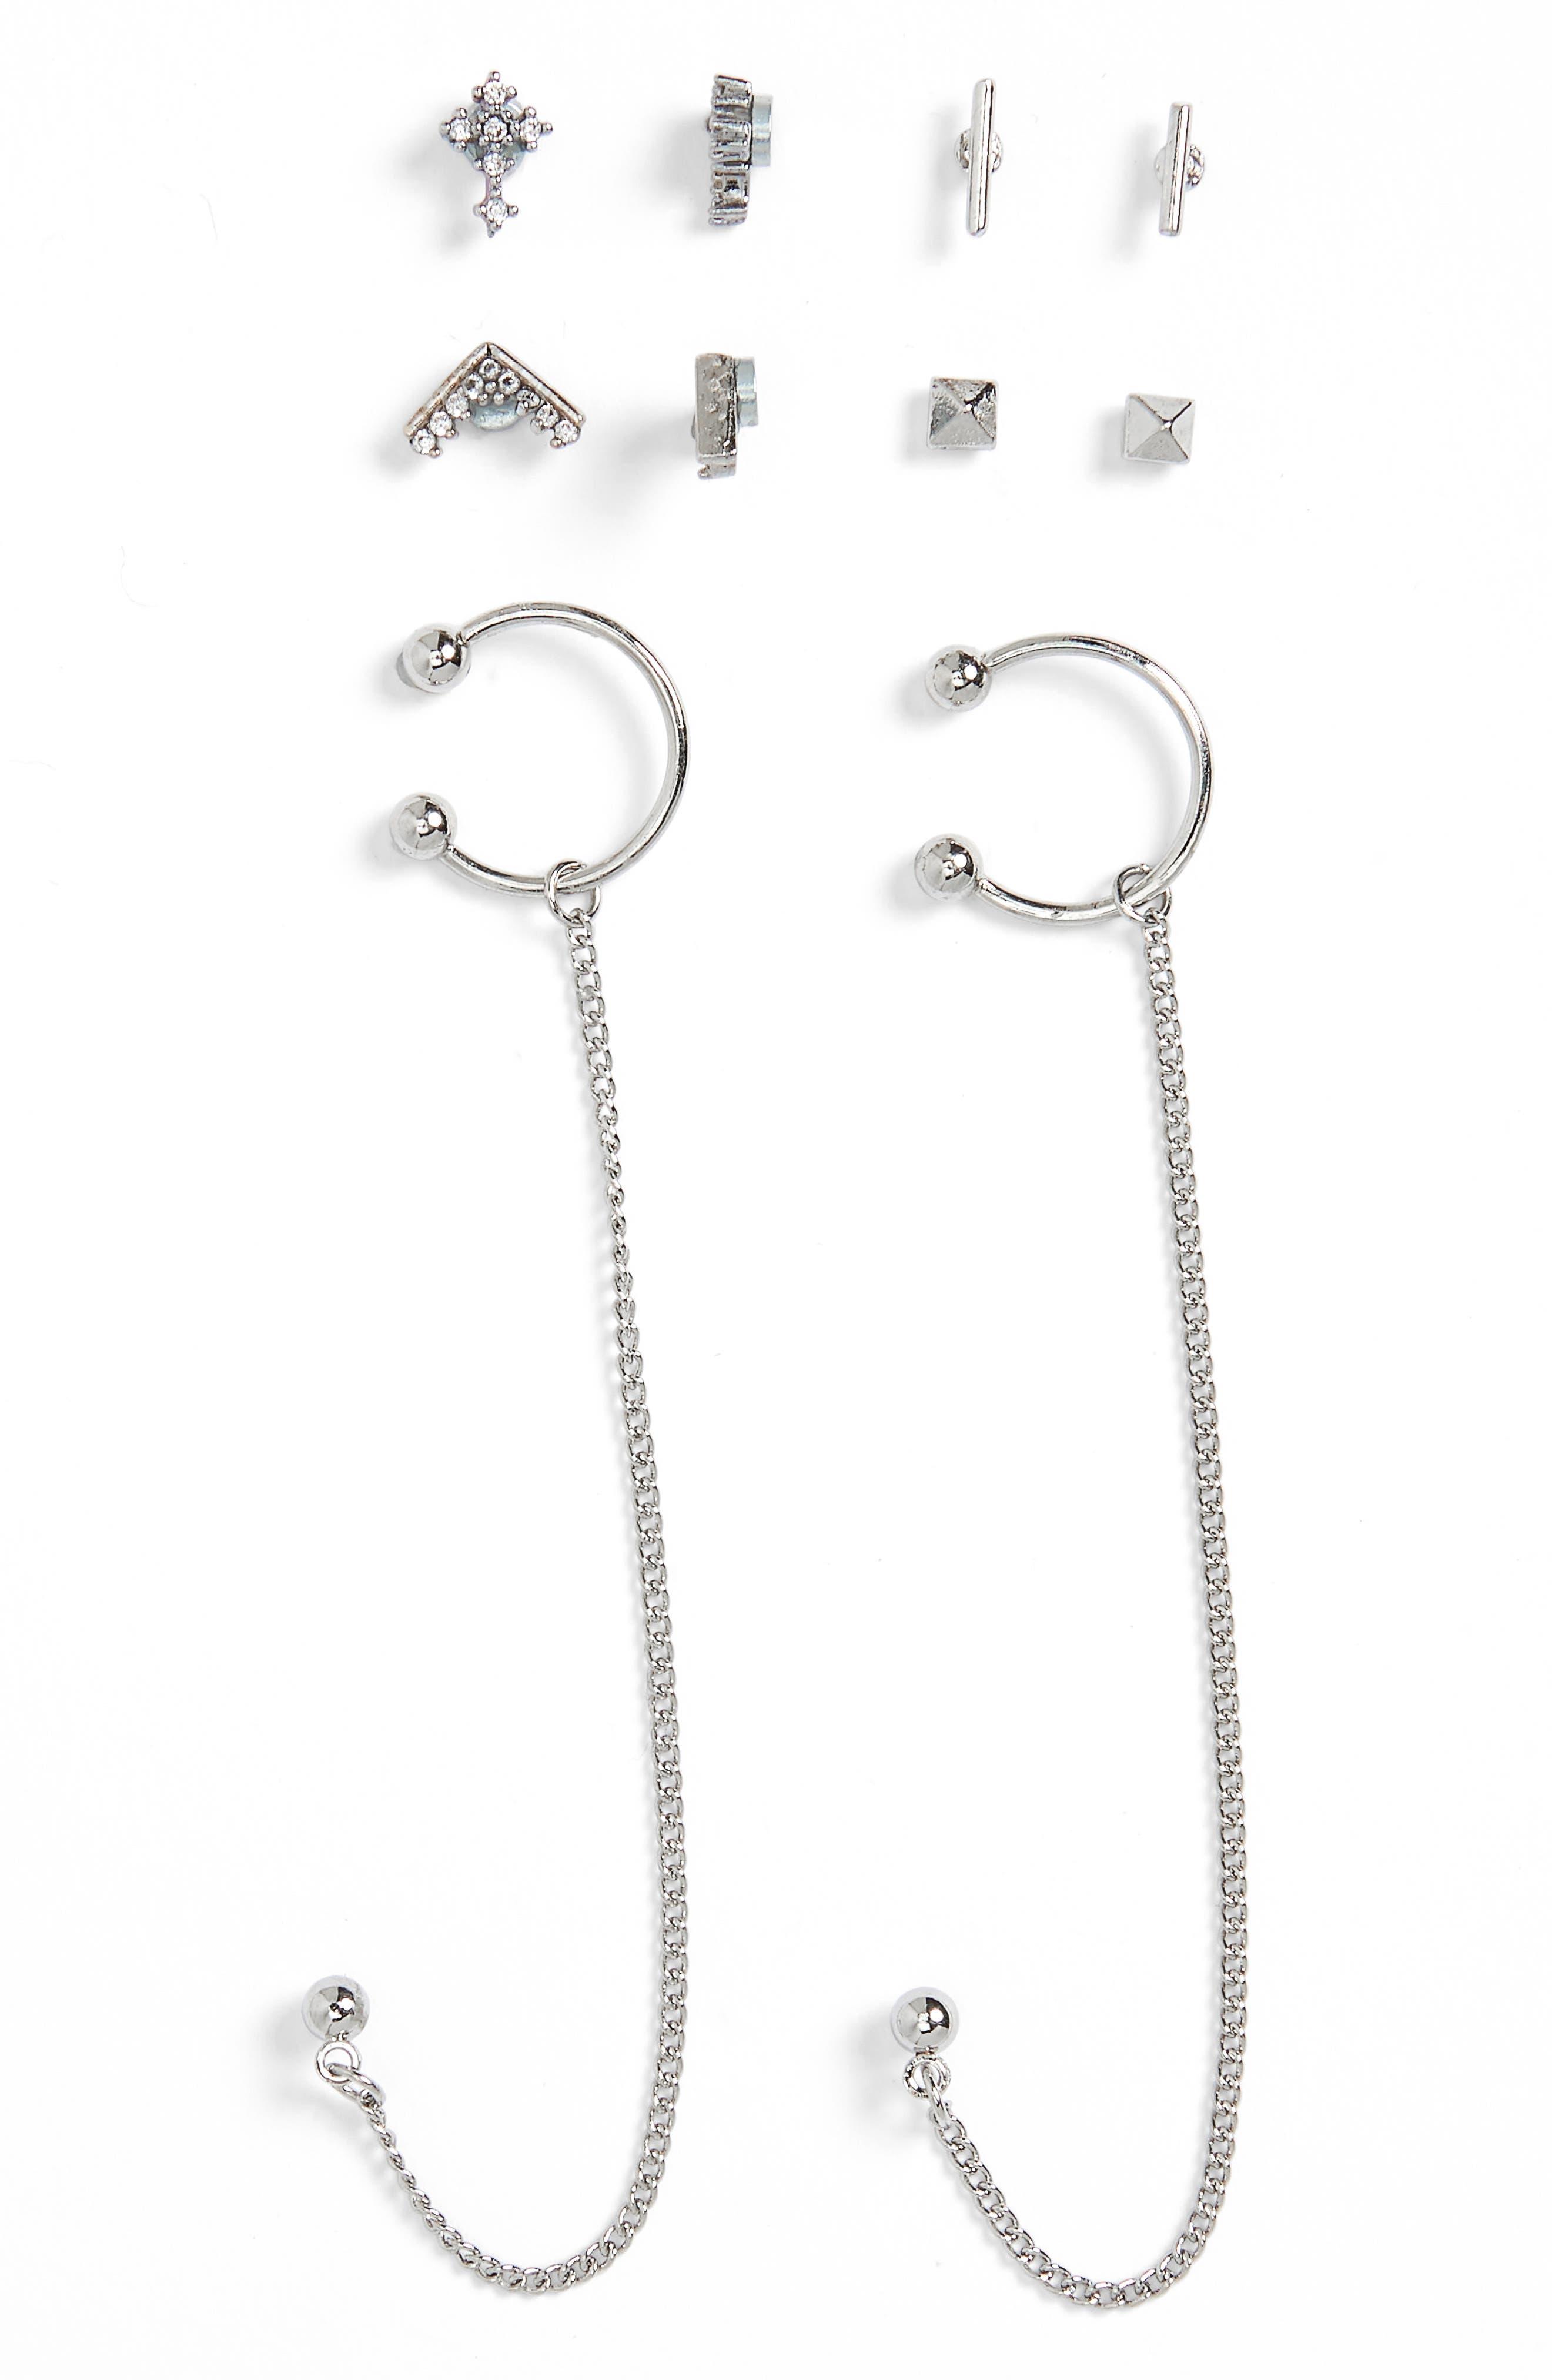 Set of 5 Stud & Chain Earrings,                         Main,                         color, 040